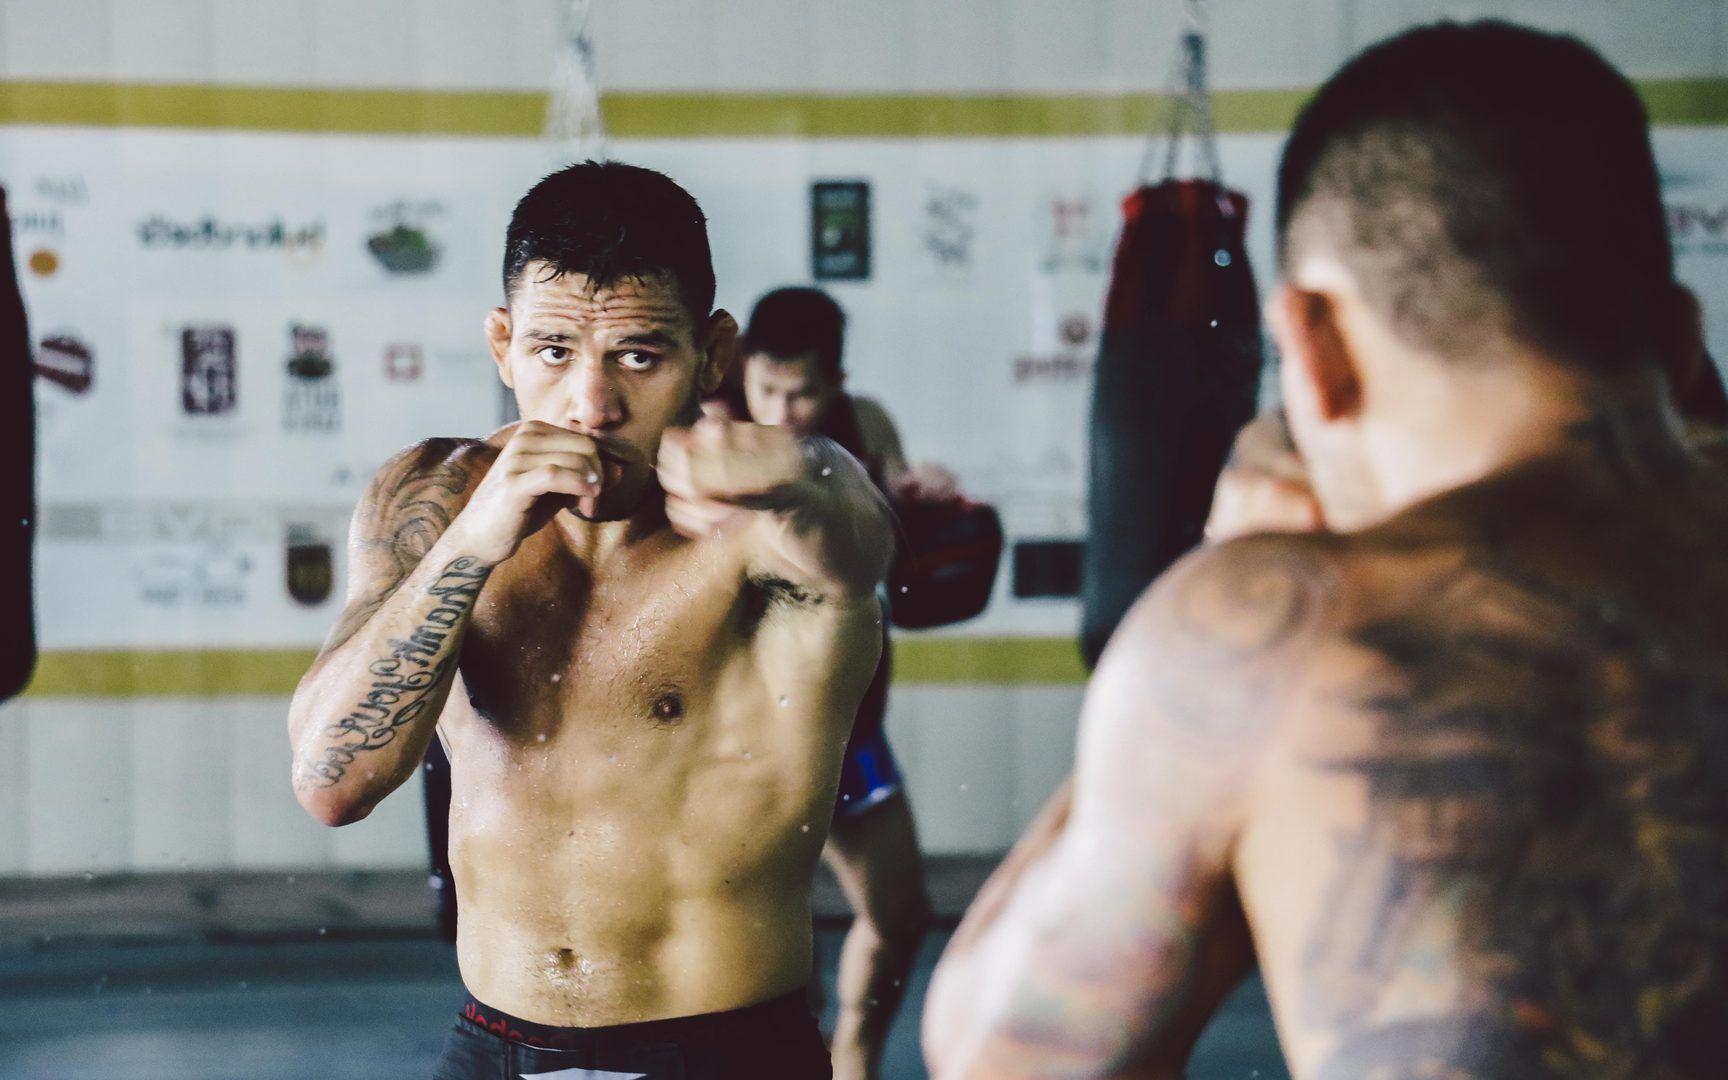 Rafael Dos Anjos Shadow Boxing